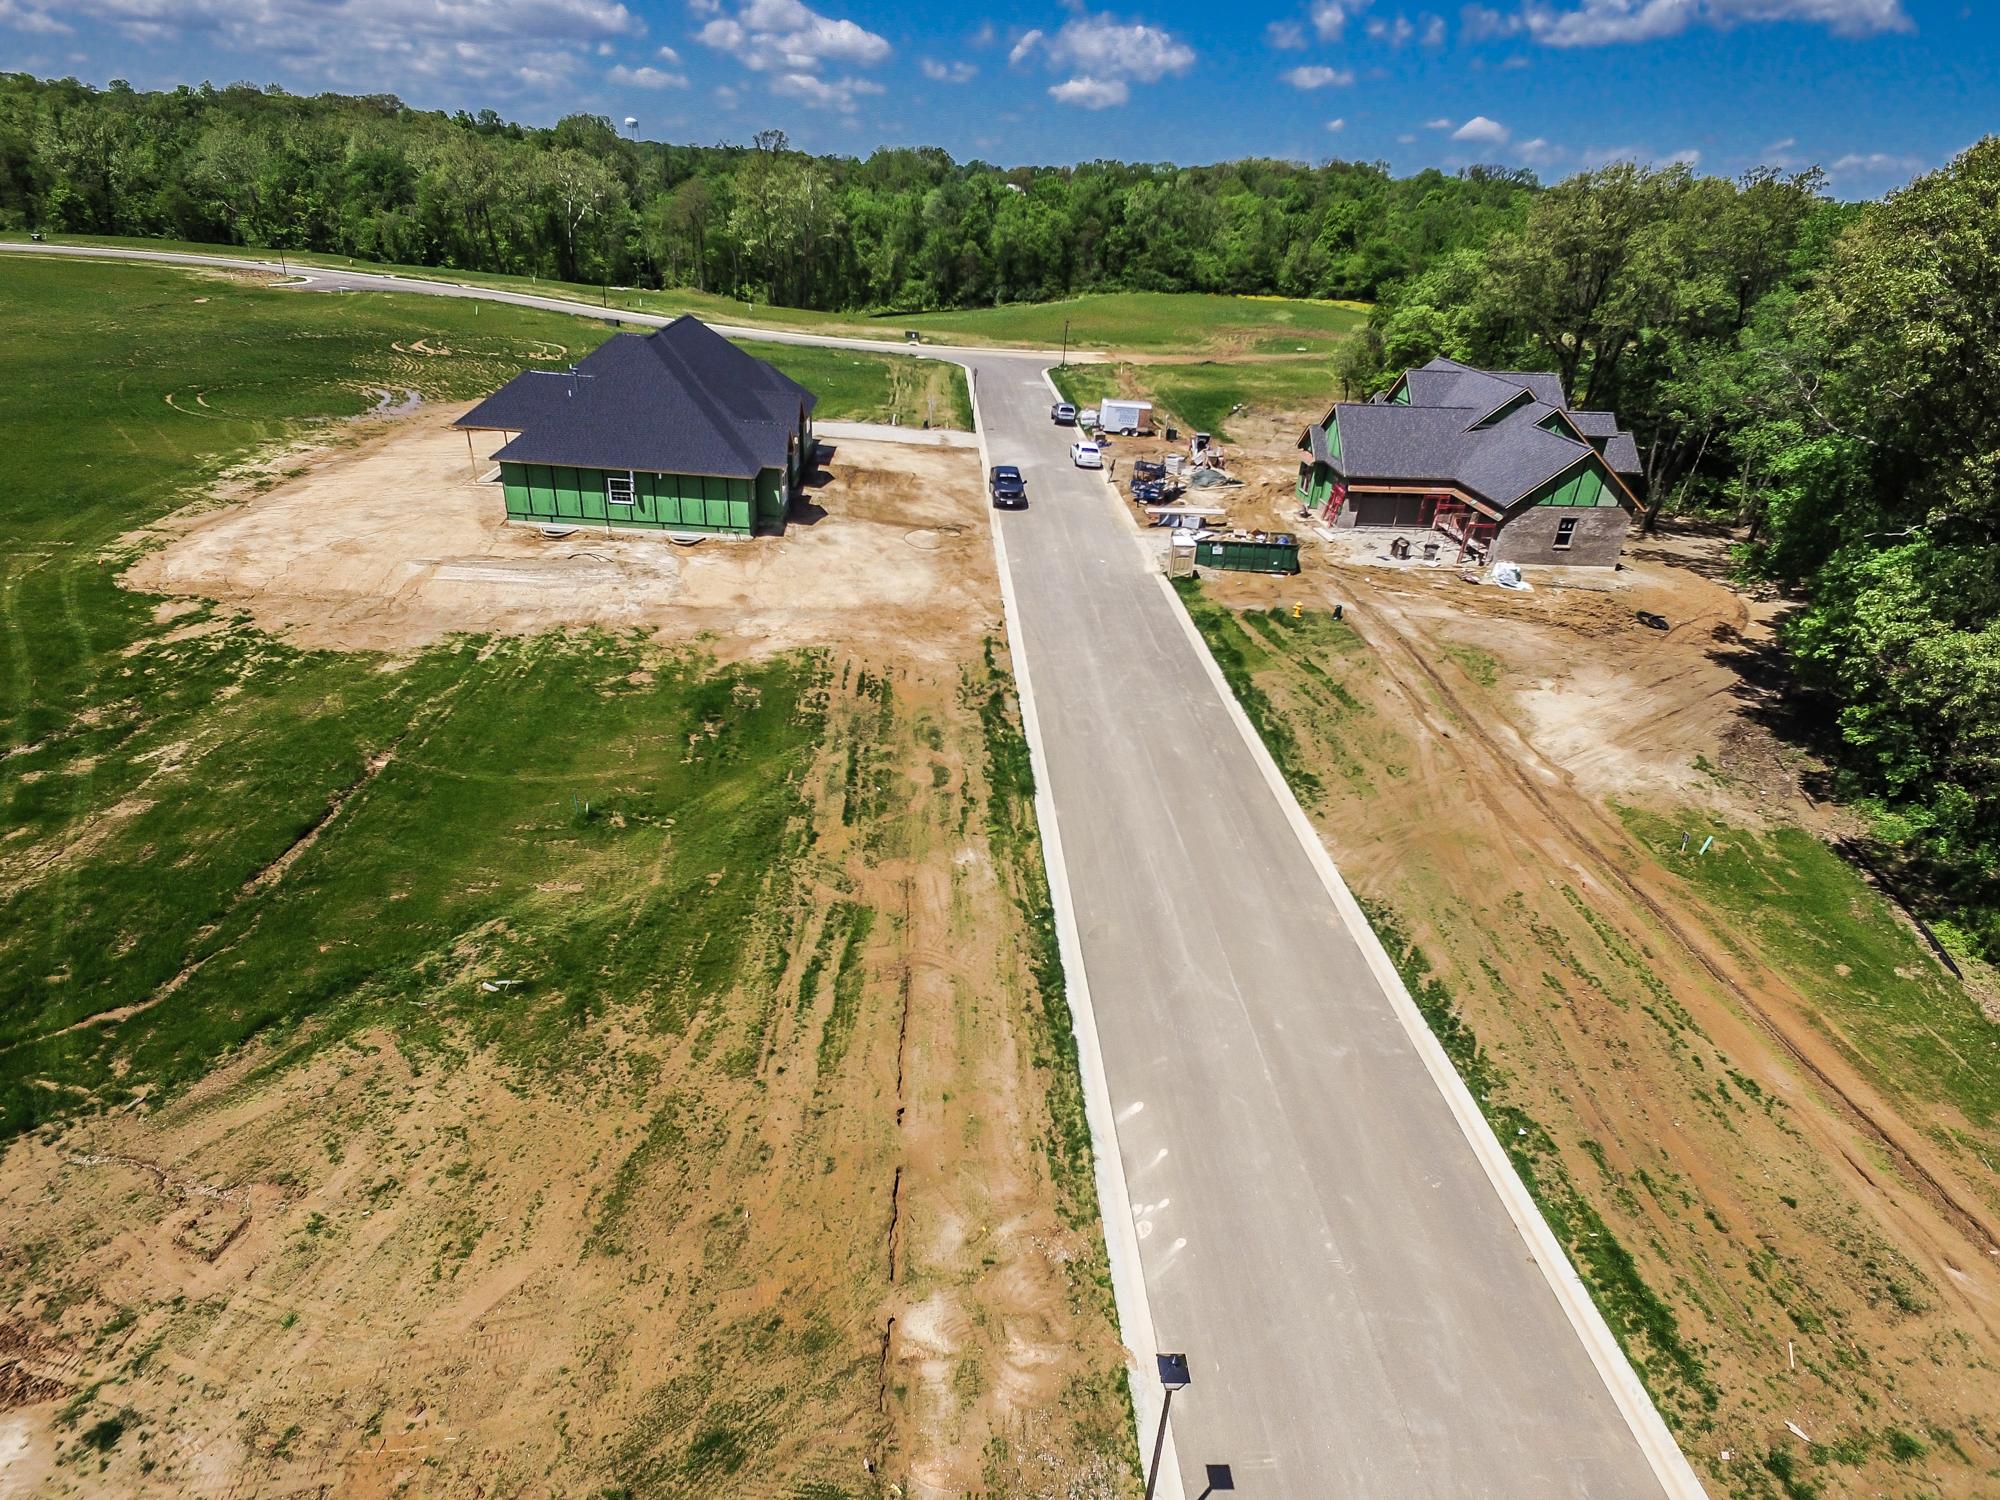 Bethel_Ridge_Farms_O'Fallon_Illinois_Aerials_Progress_5.3.17-8.jpg